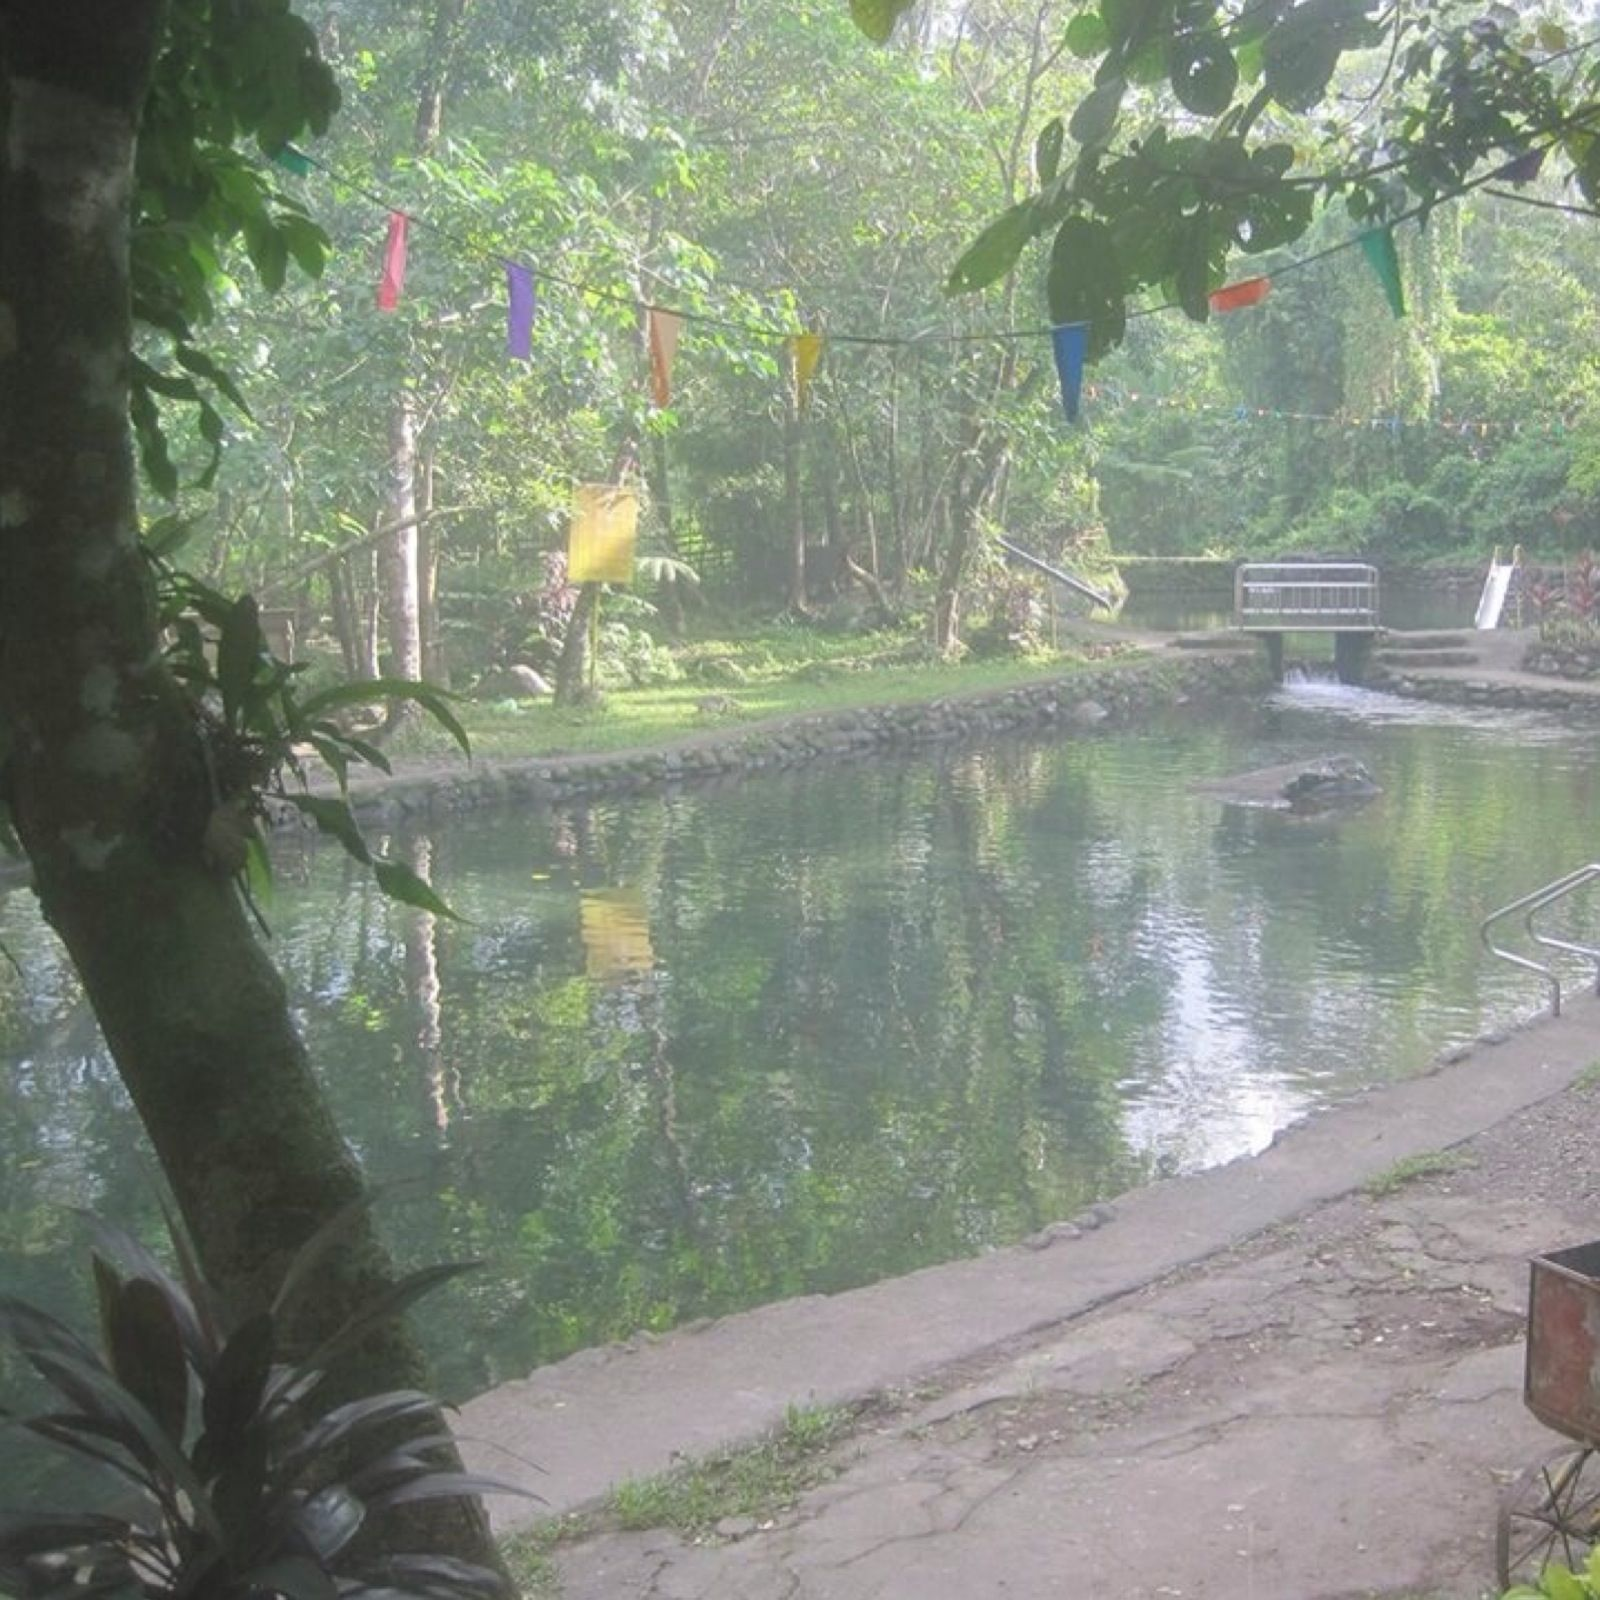 (Sinagtala Resort - Labo, Camarines Norte, PHL)